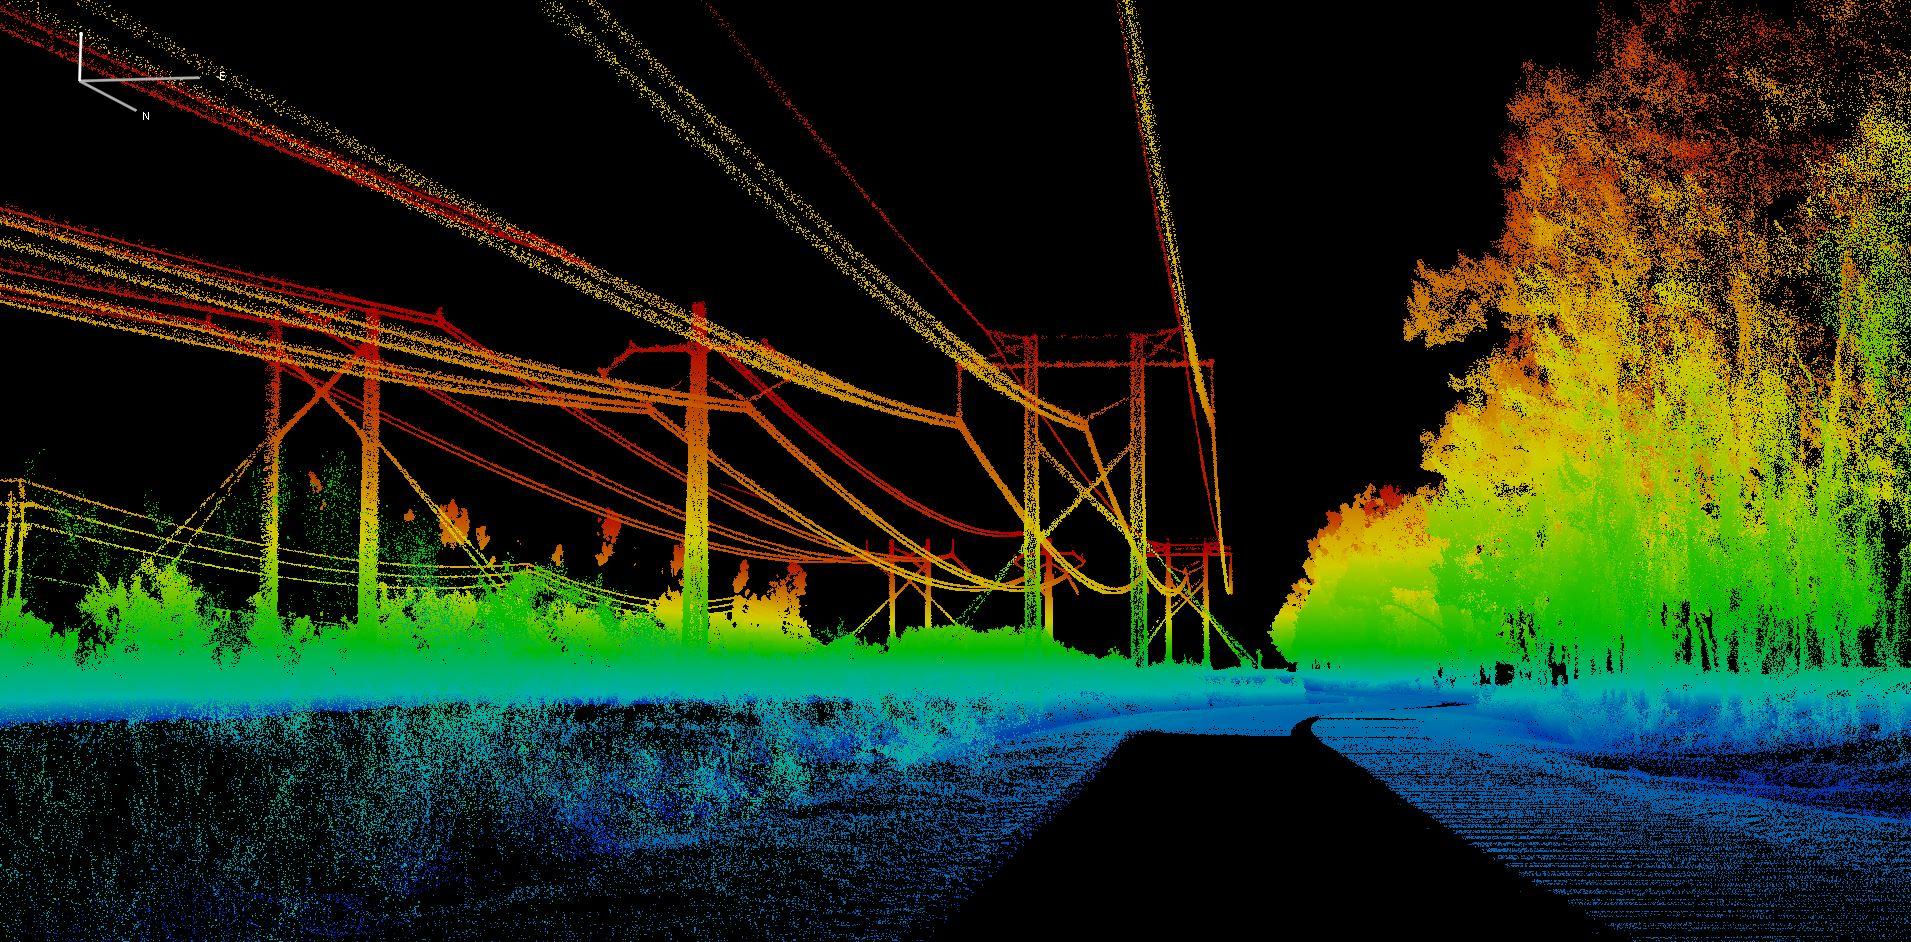 Terra Drone delivers next generation LiDAR solutions